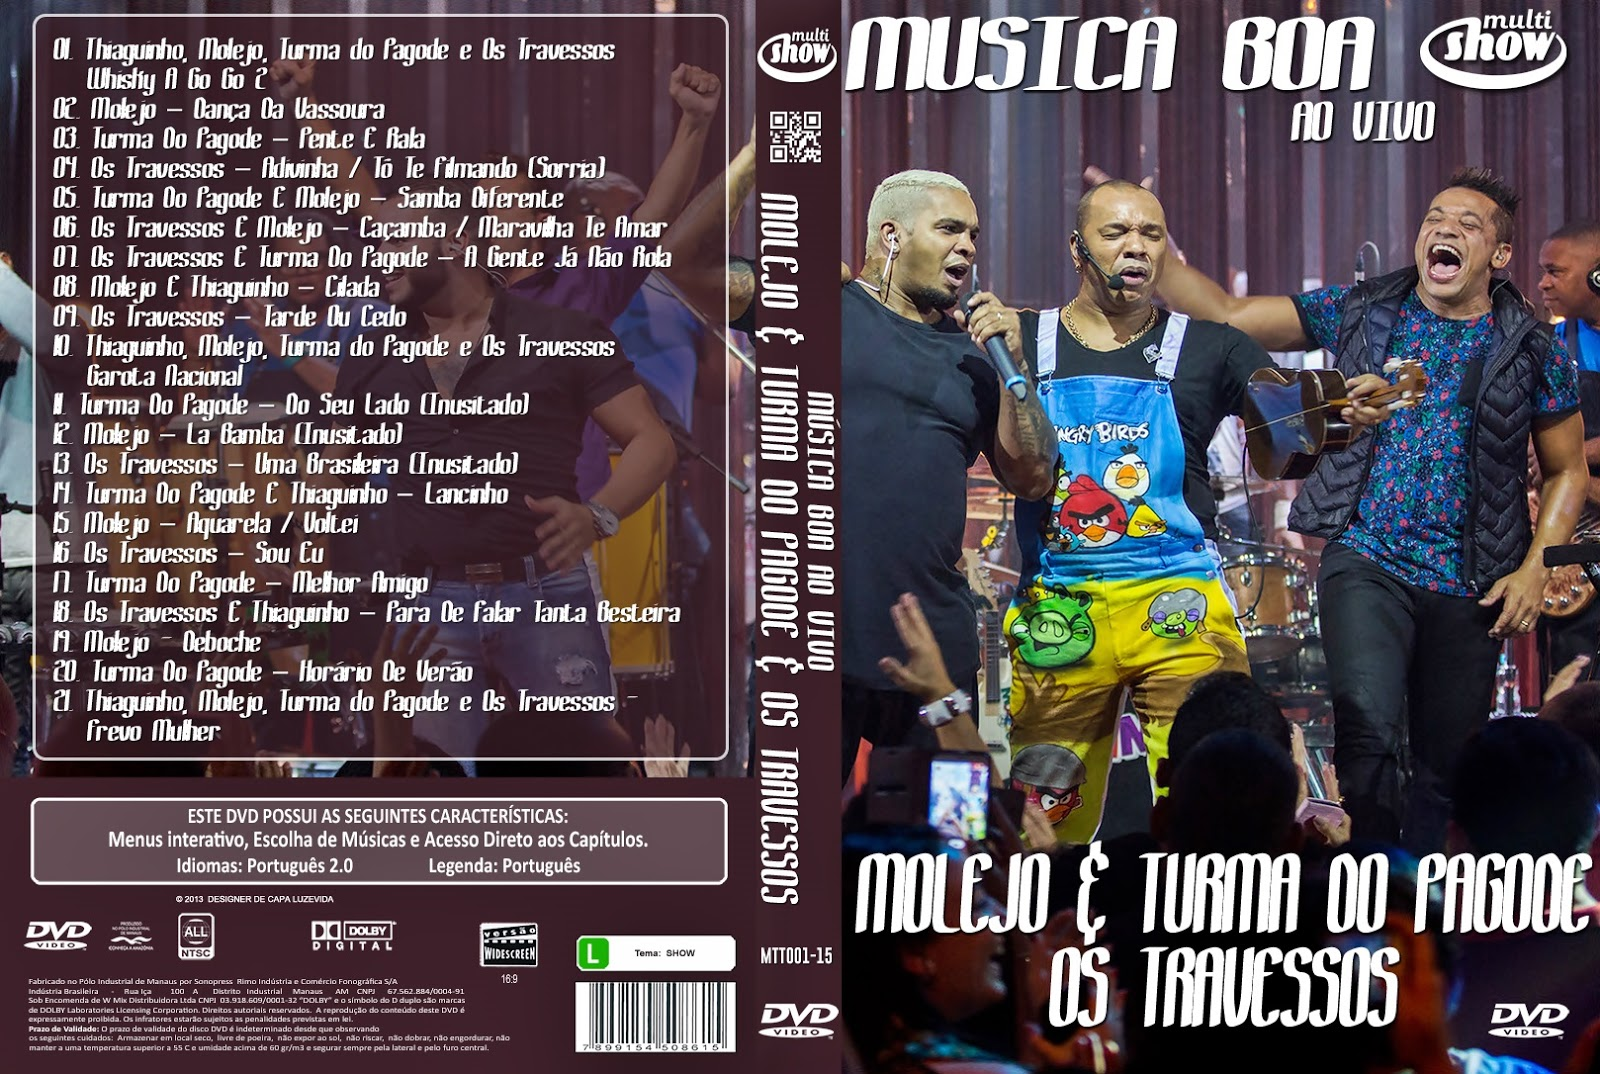 DO TURMA PAGODE 2012 DVD-R DVD BAIXAR